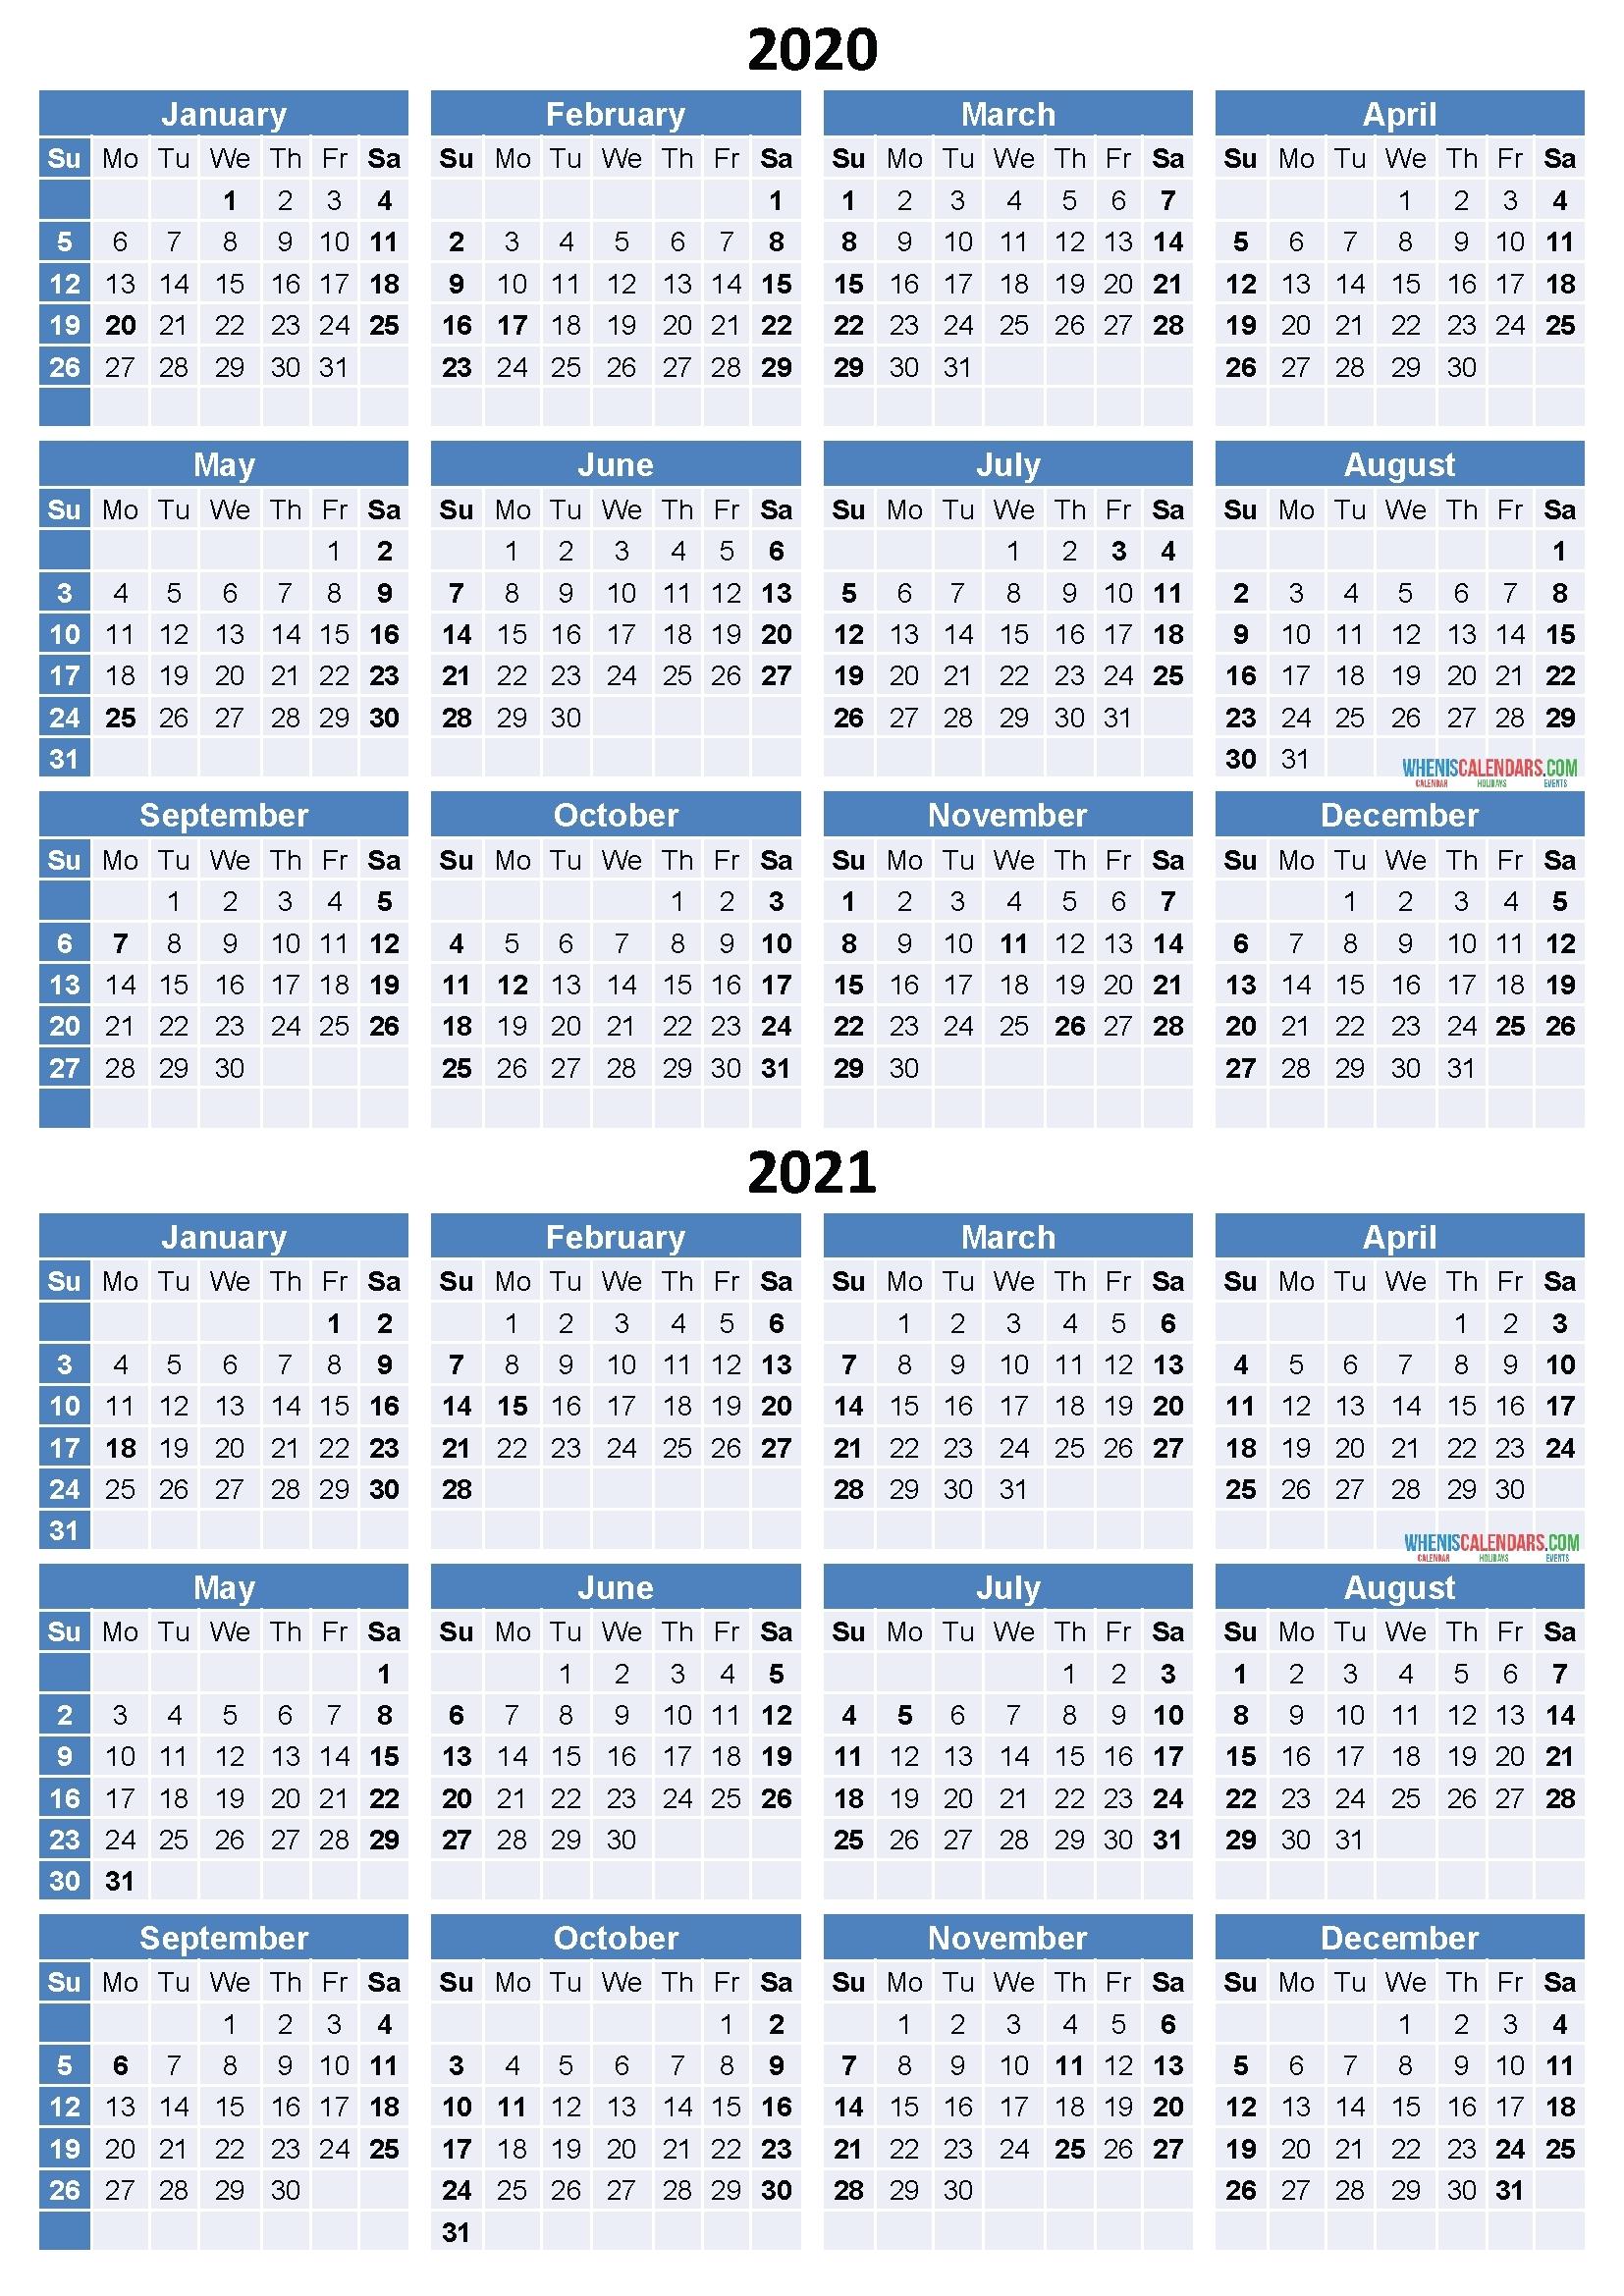 Free Printable Yearly Calendar 2021 2020 – Template Calendar Design-Rut Predictions For Michigan 2021